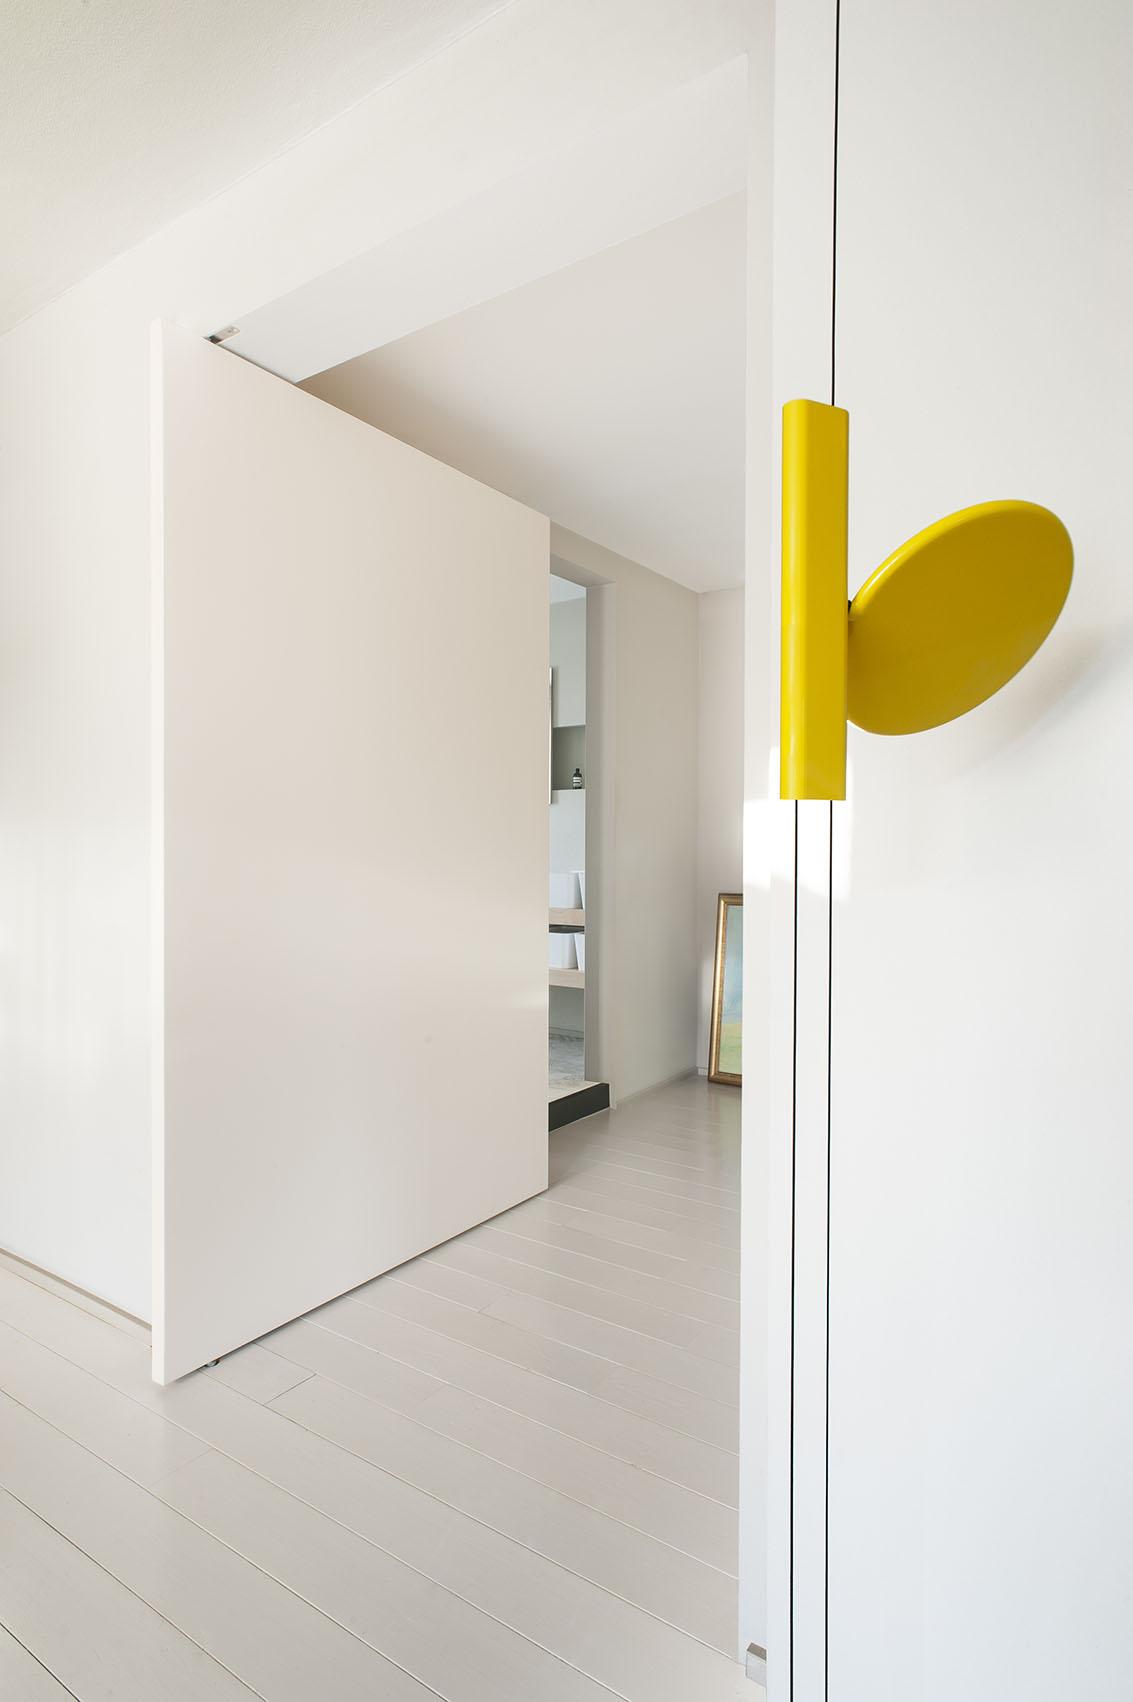 ingresso zona living con porta bilico officina magisafi - luca argenton